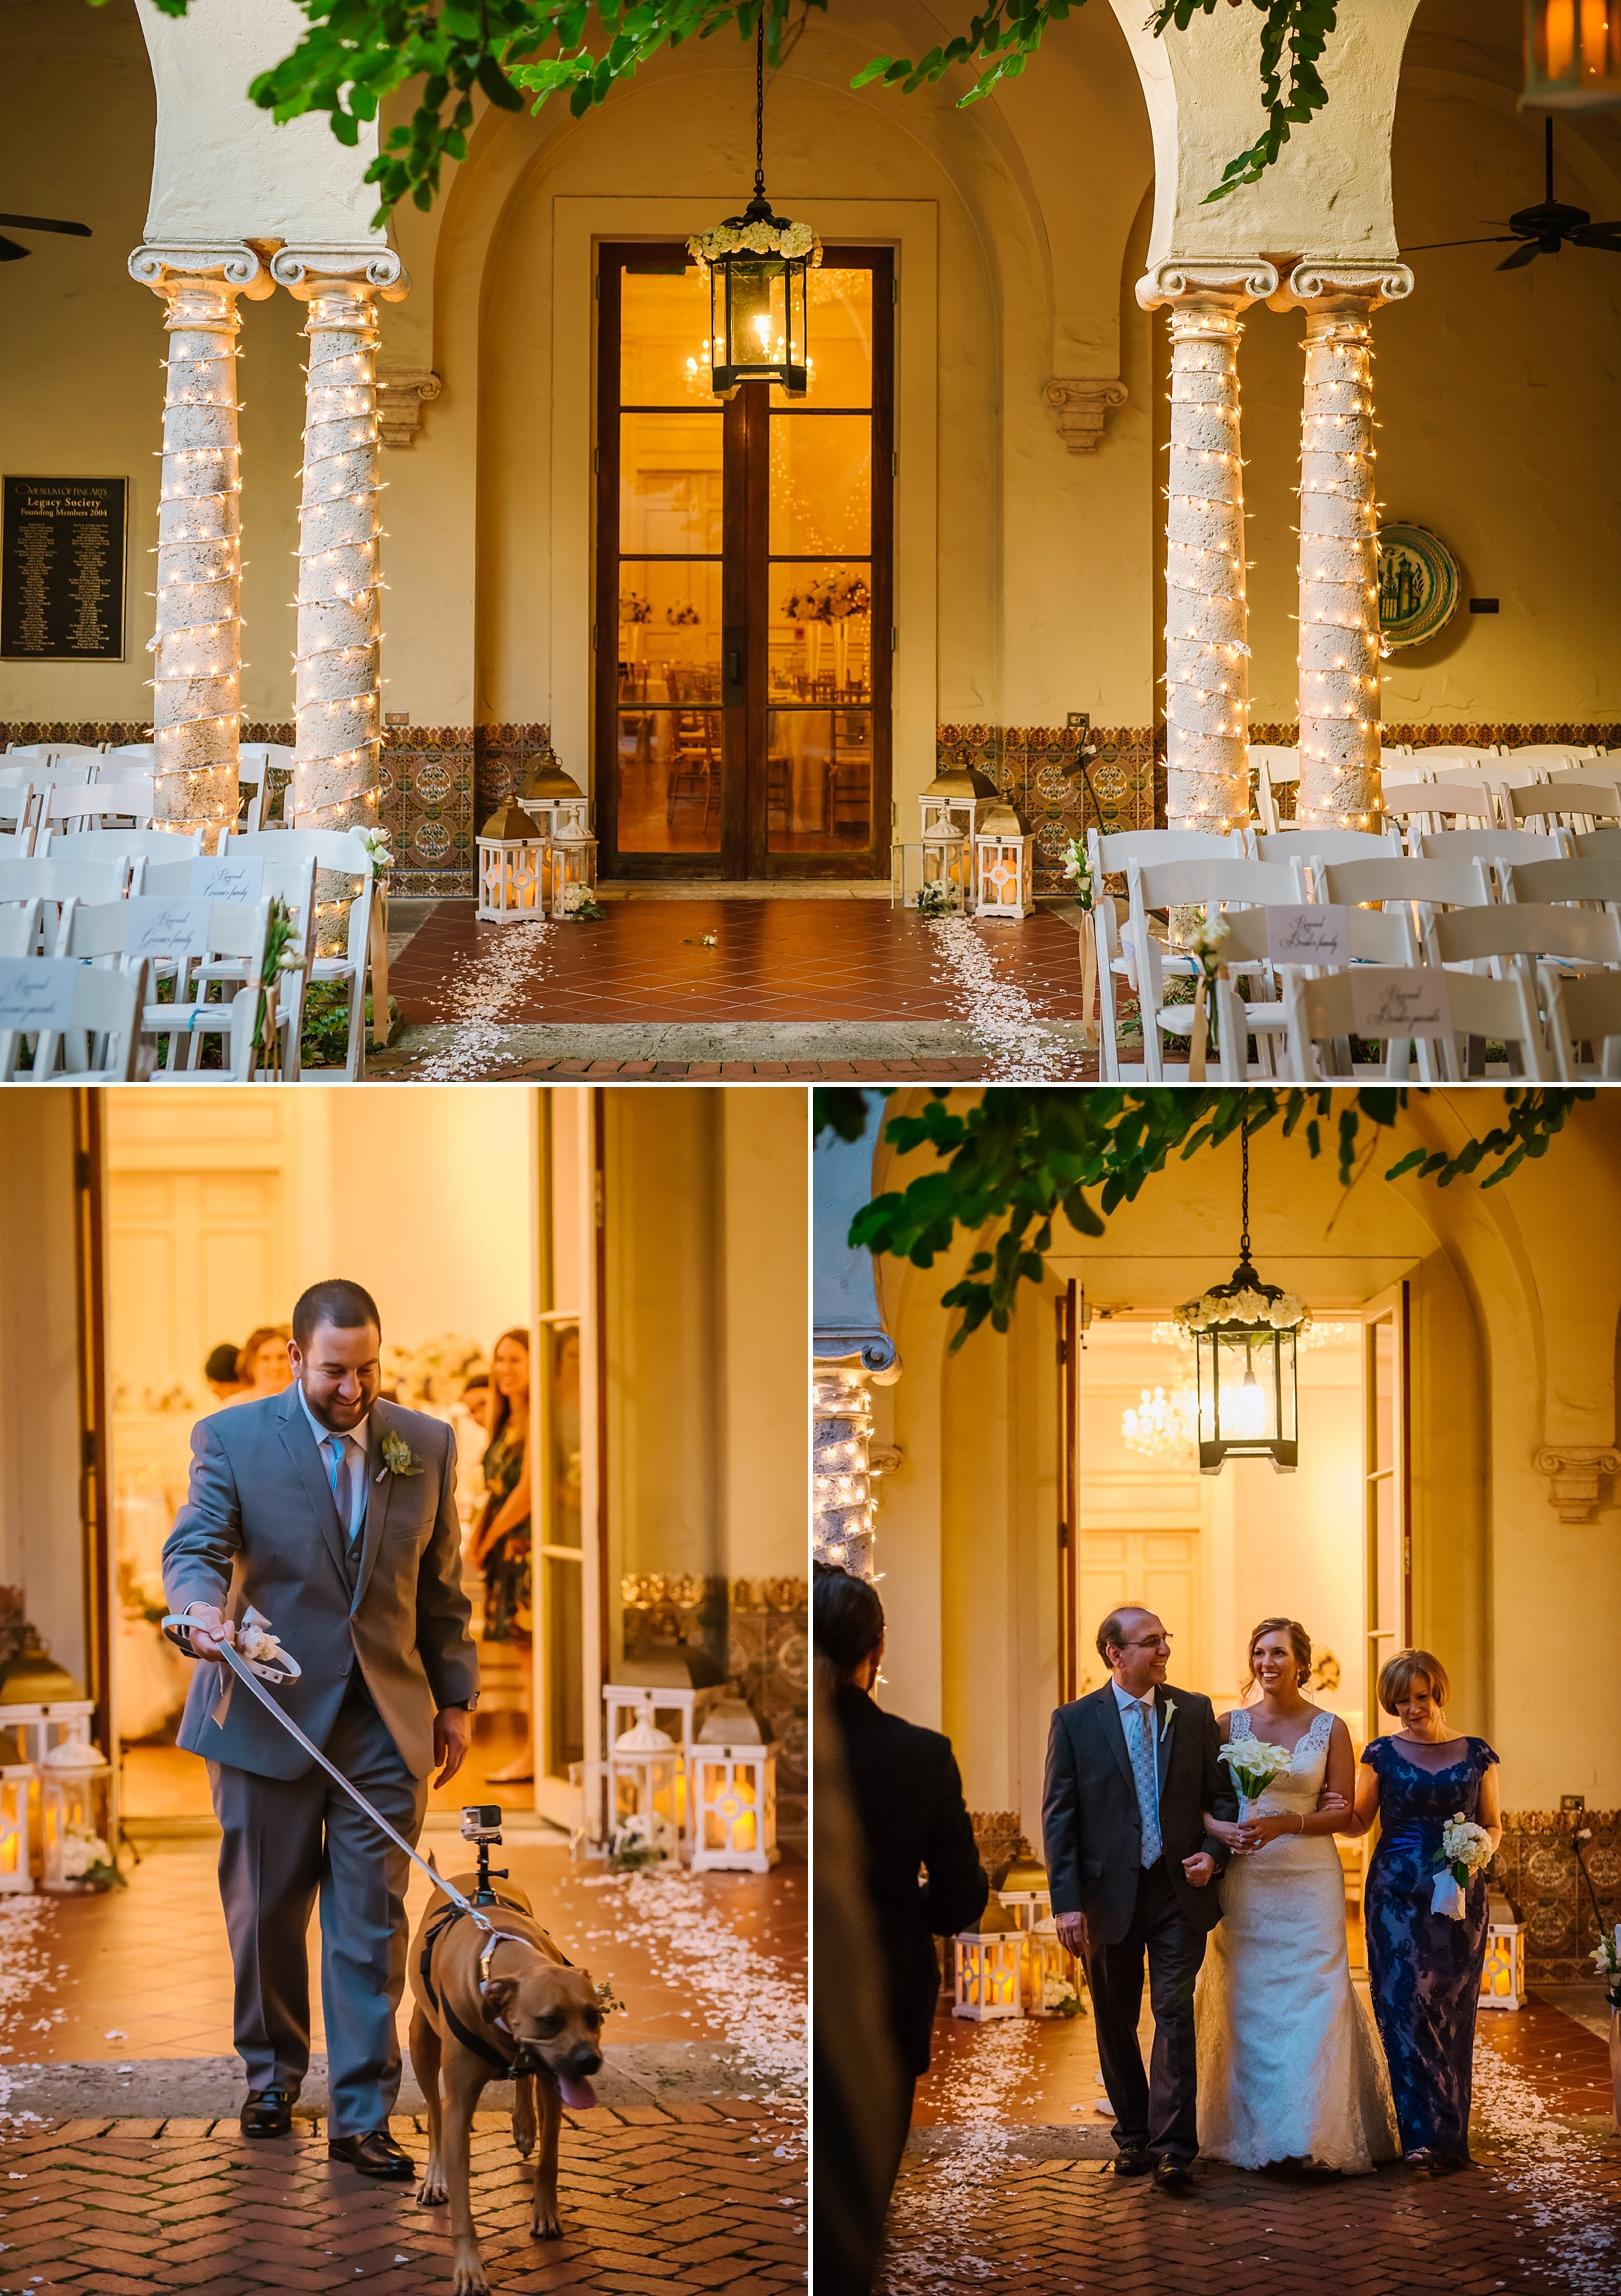 st-pete-art-museum-wedding-vinoy-ashlee-hamon-photography_0013.jpg